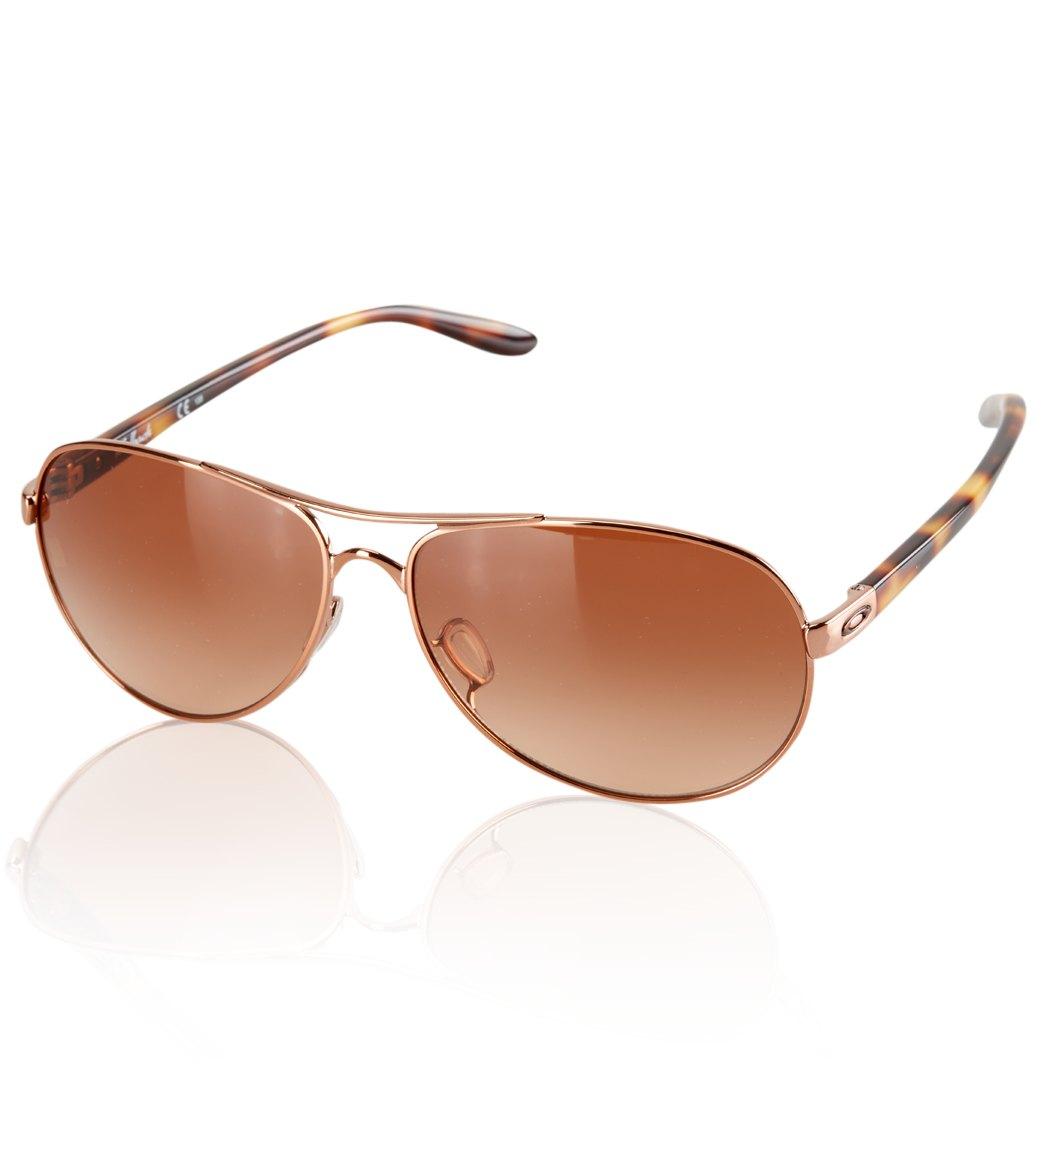 0f93164f72 Oakley Women s Feedback Sunglasses at SwimOutlet.com - Free Shipping